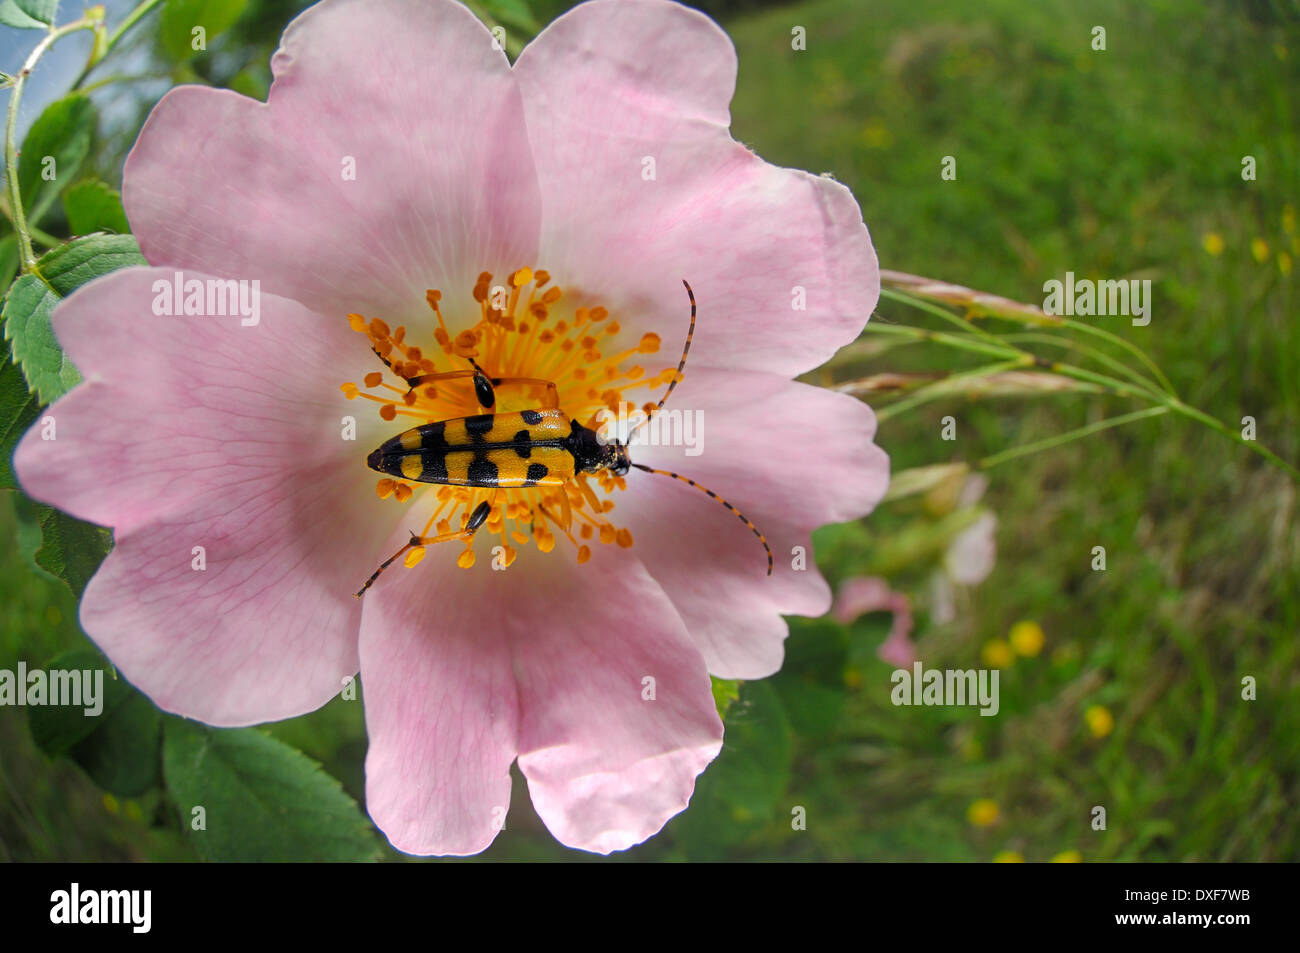 Spotted Longhorn Rutpela maculata | Schmalbock-Käfer auf Rose, Gefleckter Schmalbock, Strangalia maculata - Stock Image